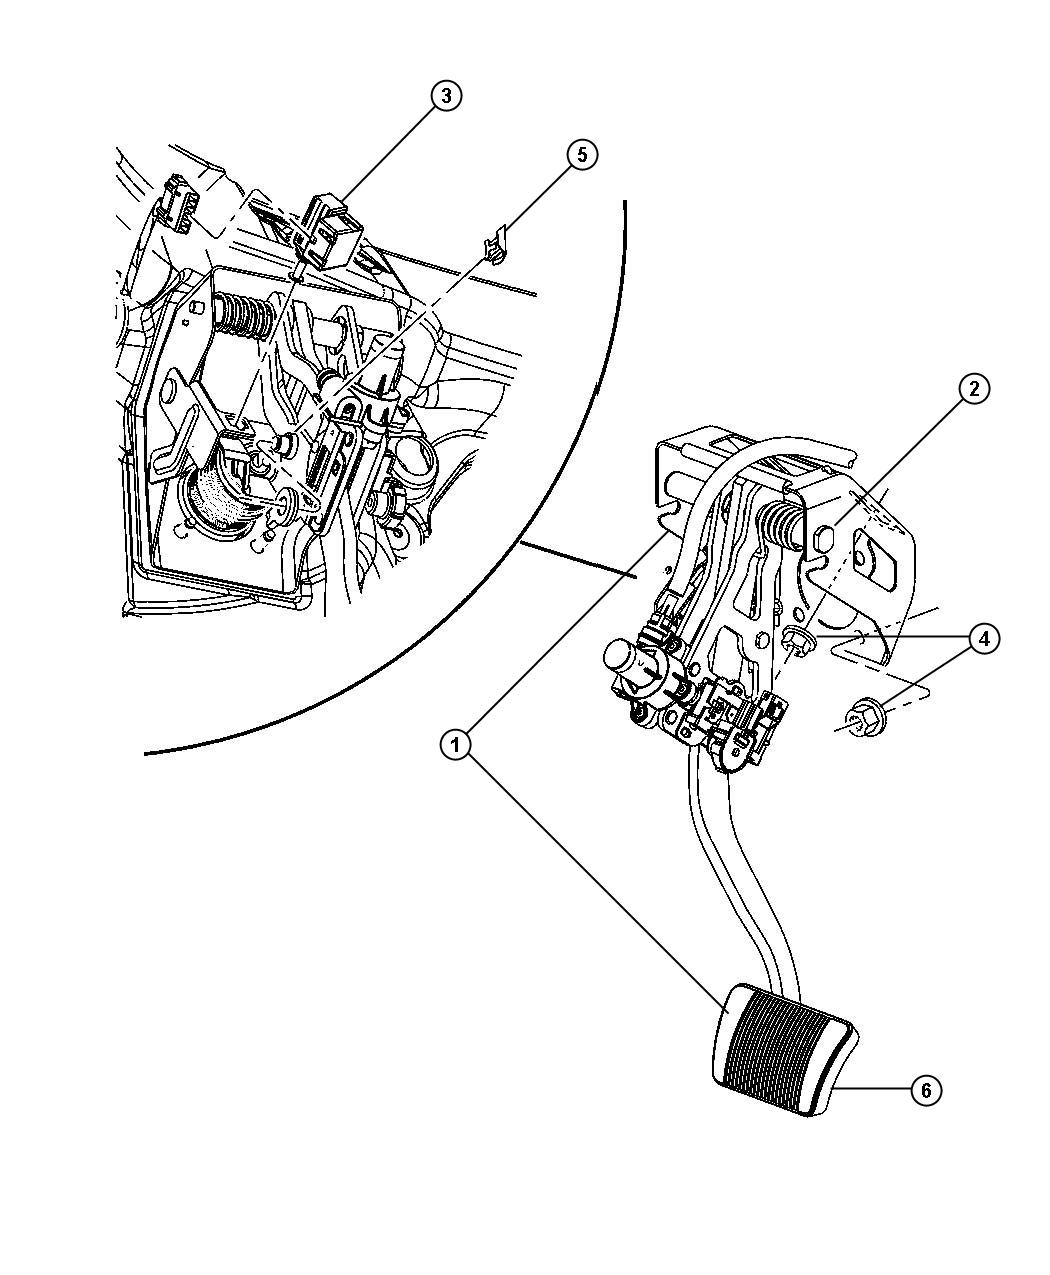 Dodge Nitro Sxt Pedal Brake Power Adjust Xap Memory Xam